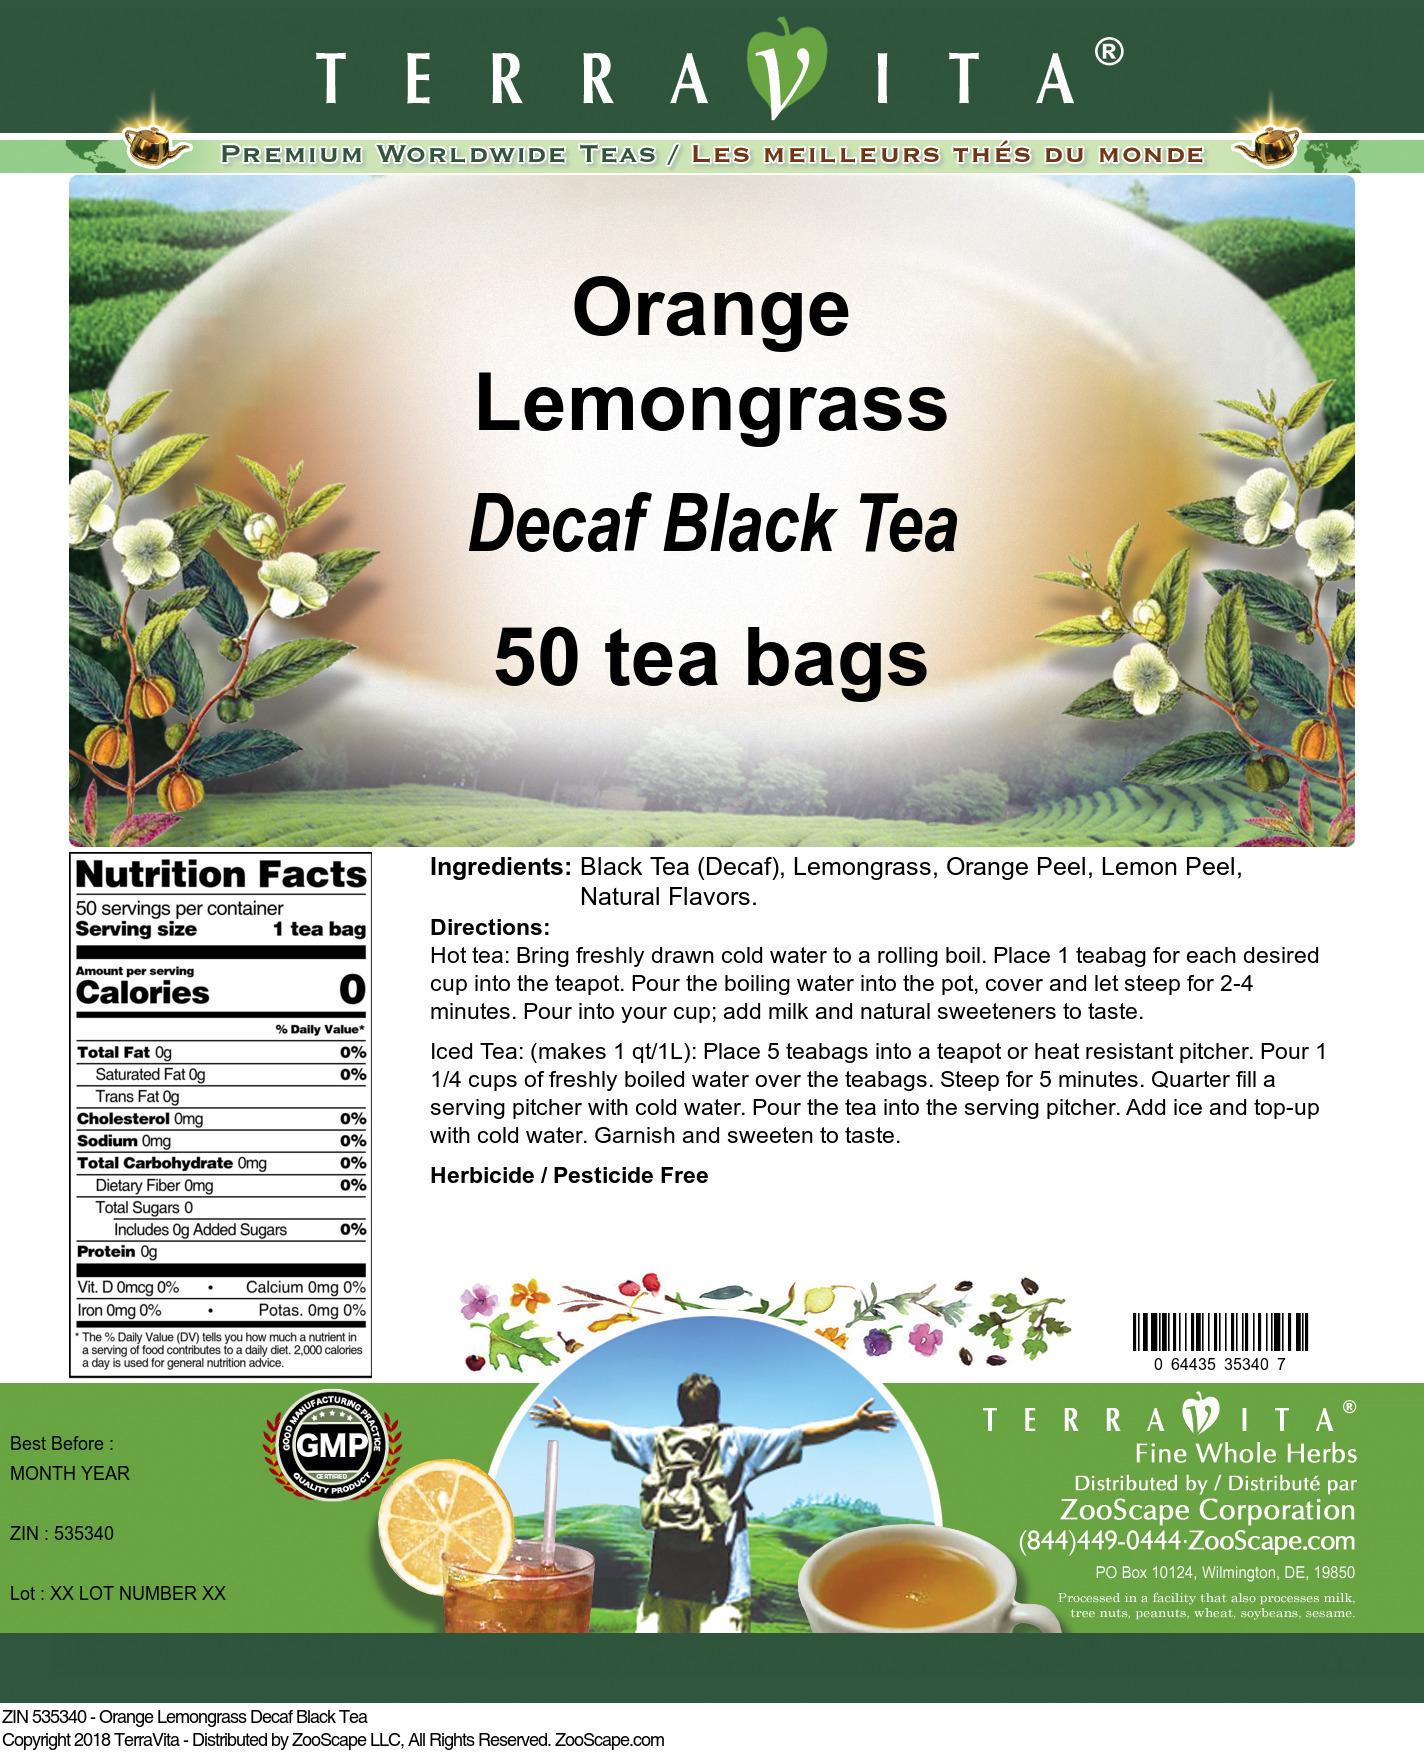 Orange Lemongrass Decaf Black Tea